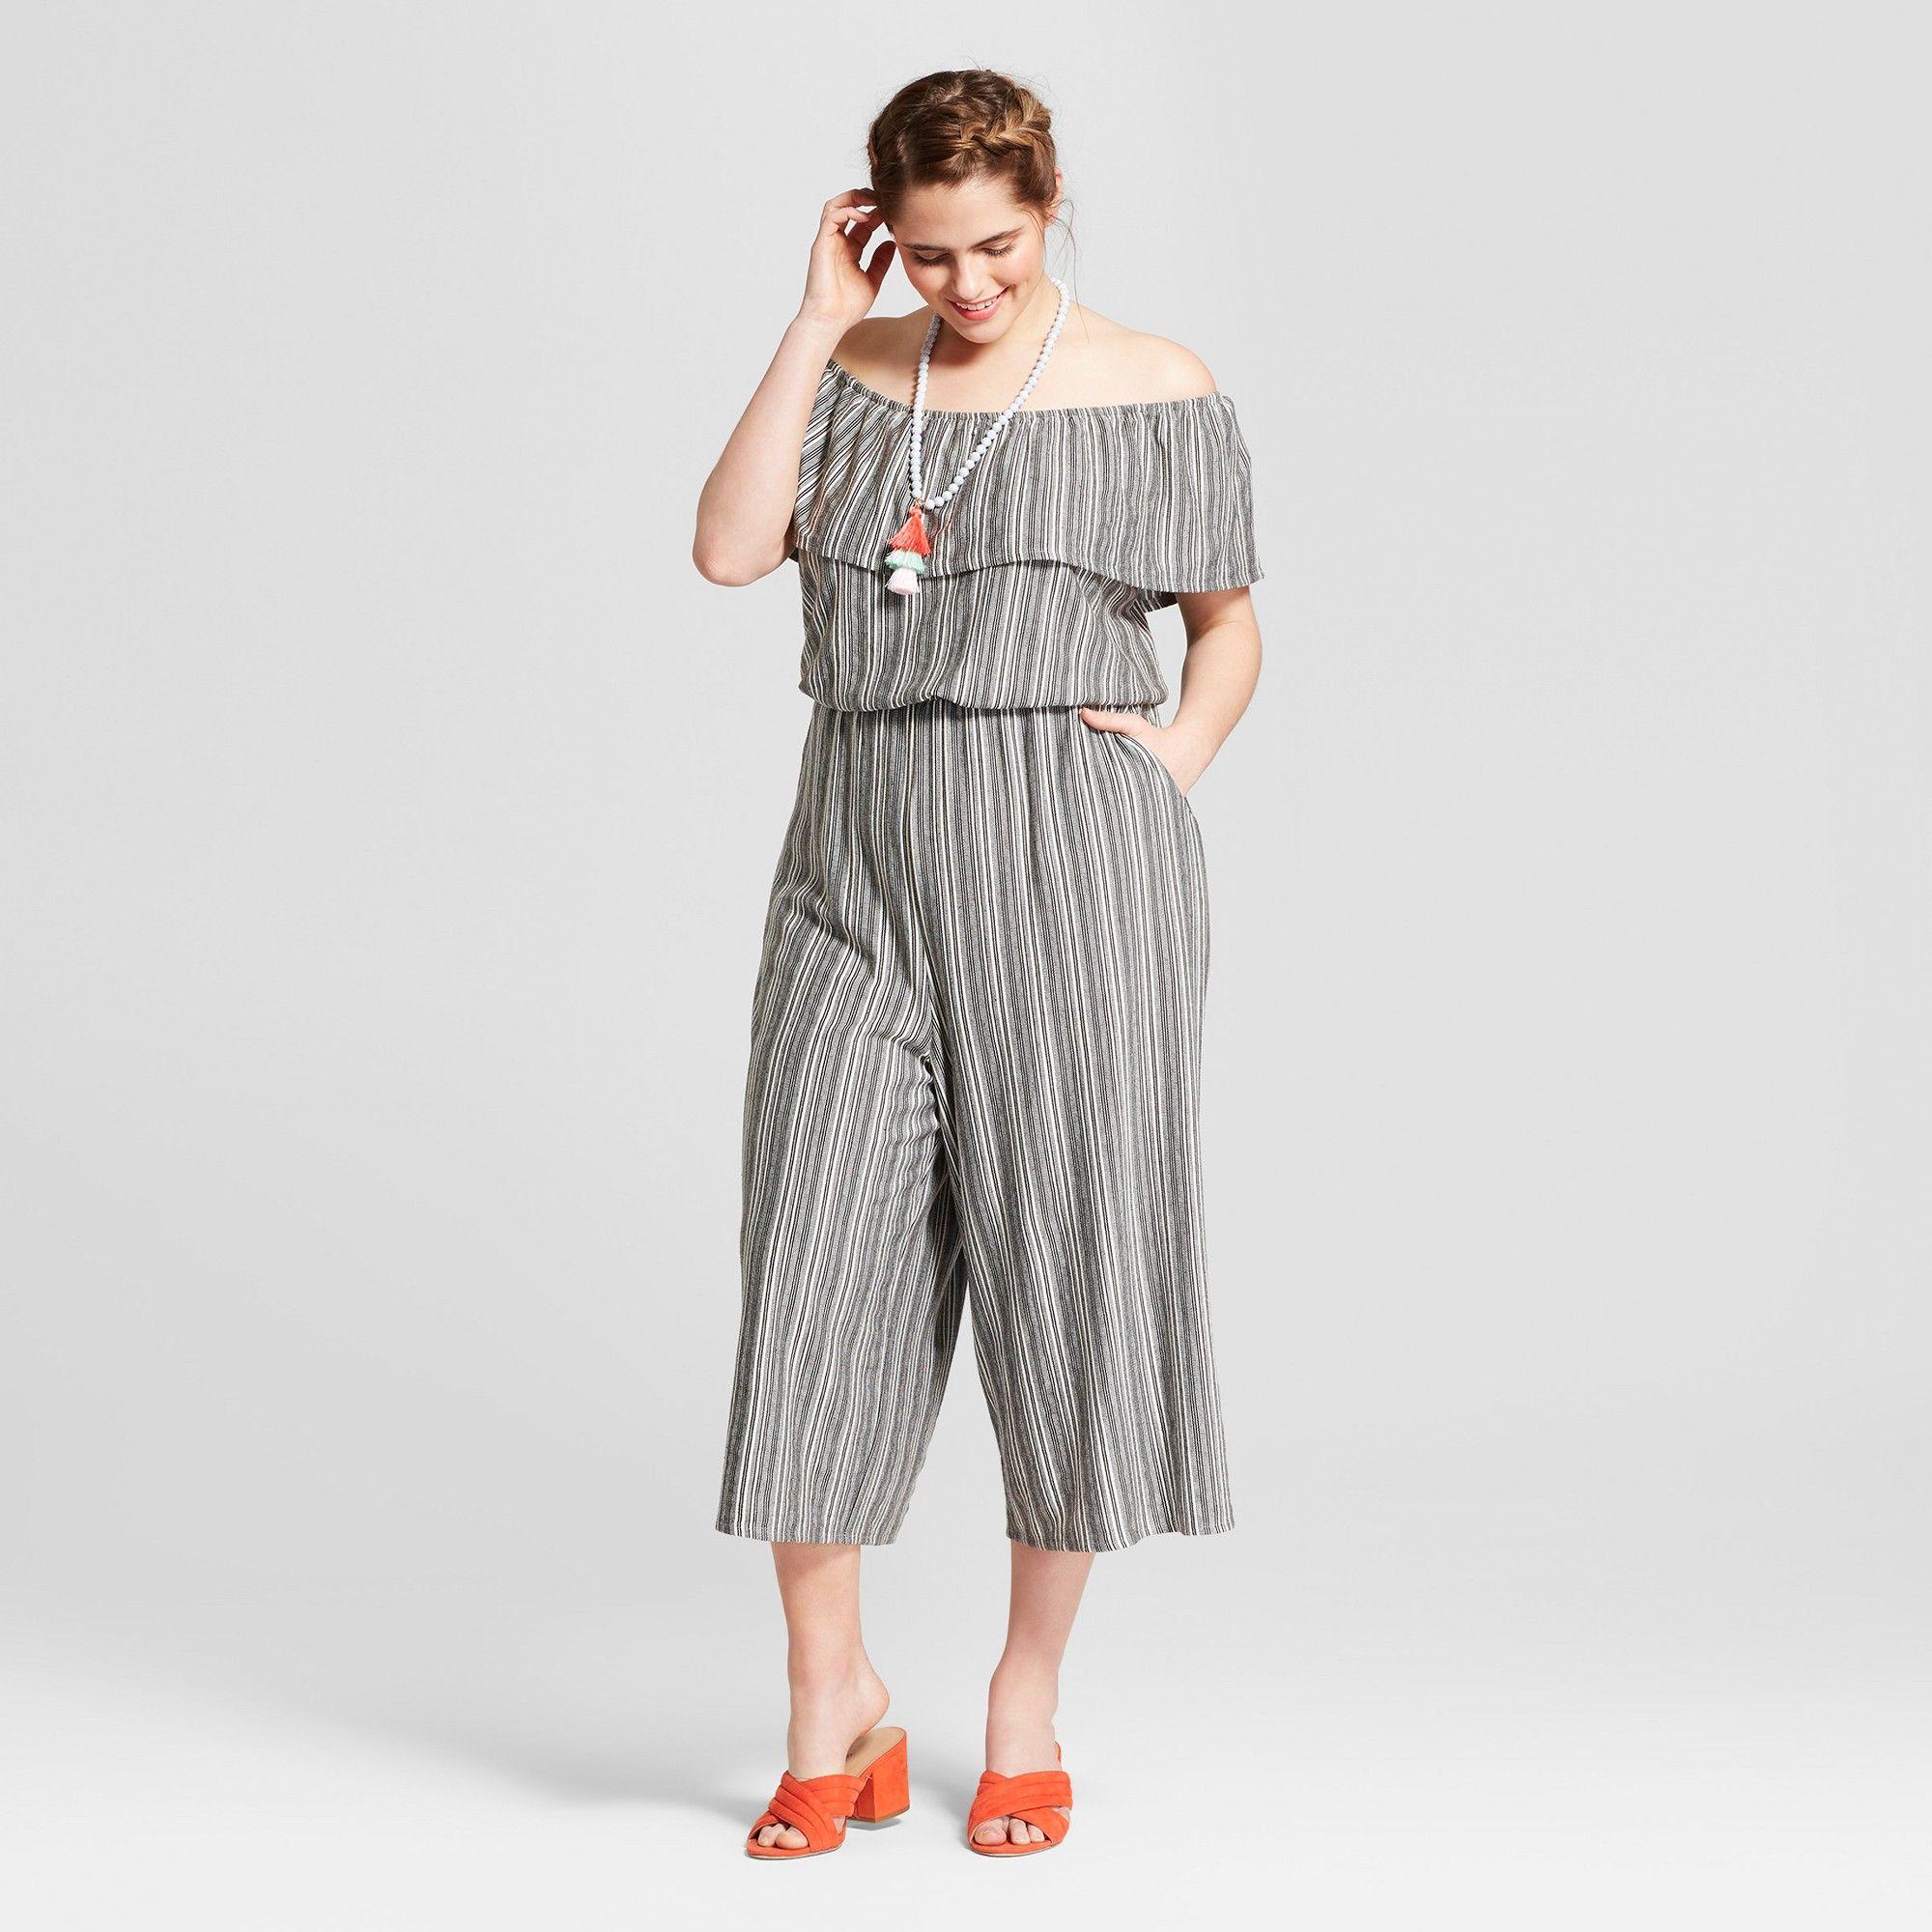 3b117ce266b Women s Plus Size Printed Off the Shoulder Knit Jumpsuit - Xhilaration  Black White 2X